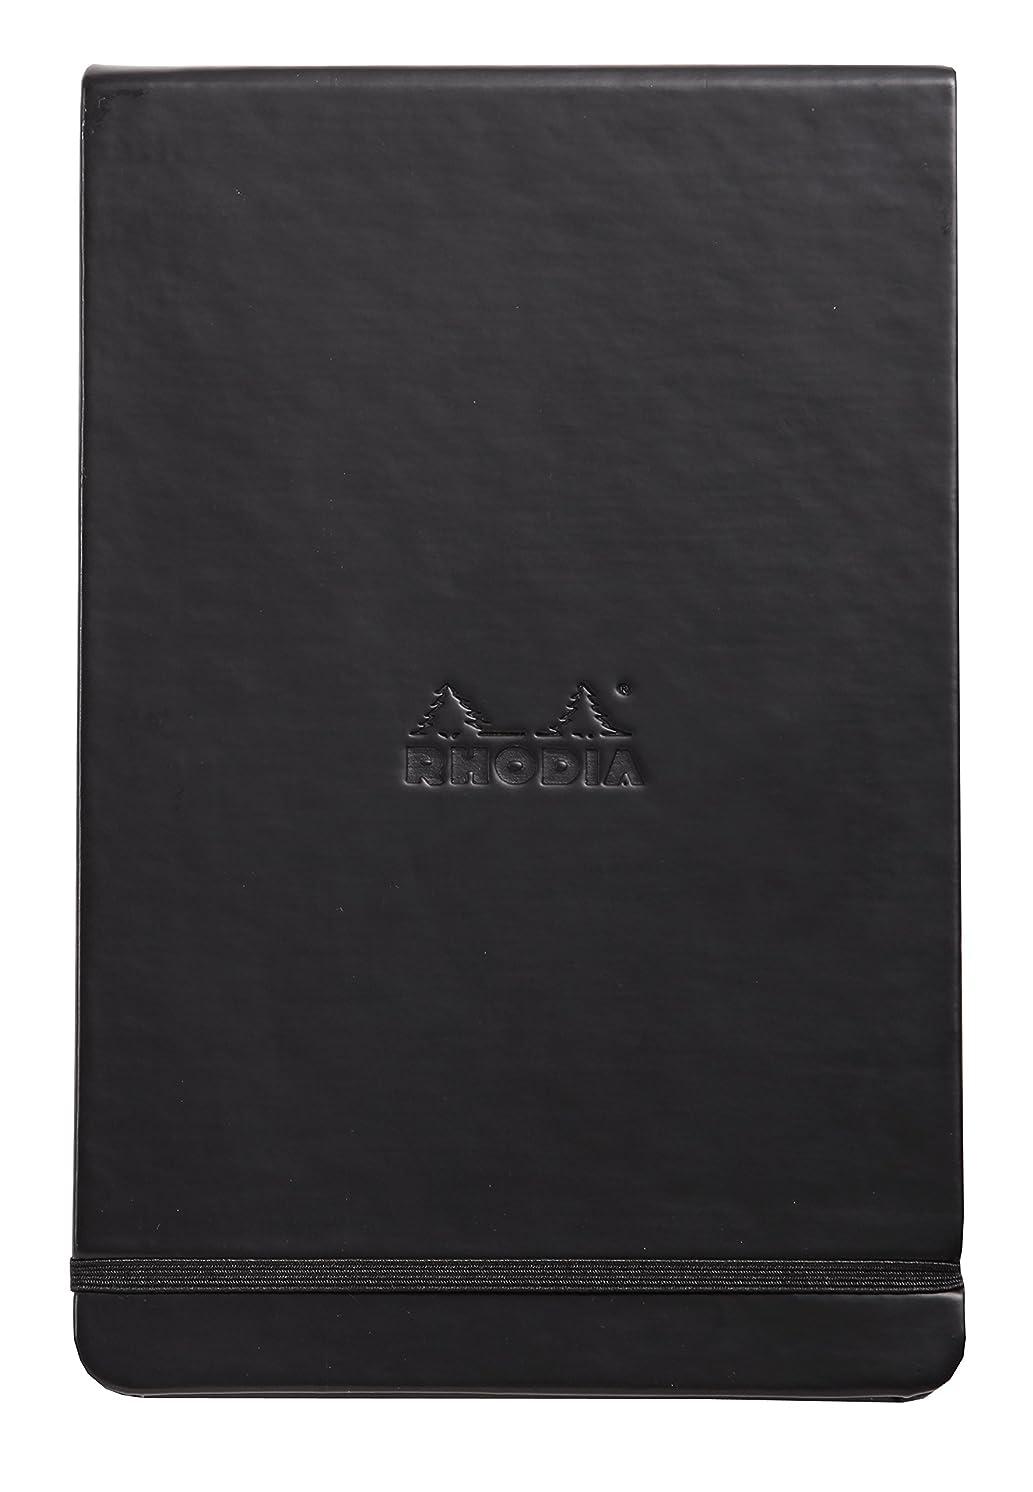 Rhodia Webnotepad Webbies - Dot Grid 96 sheets - 5 1/2 x 8 1/4 - Black Cover